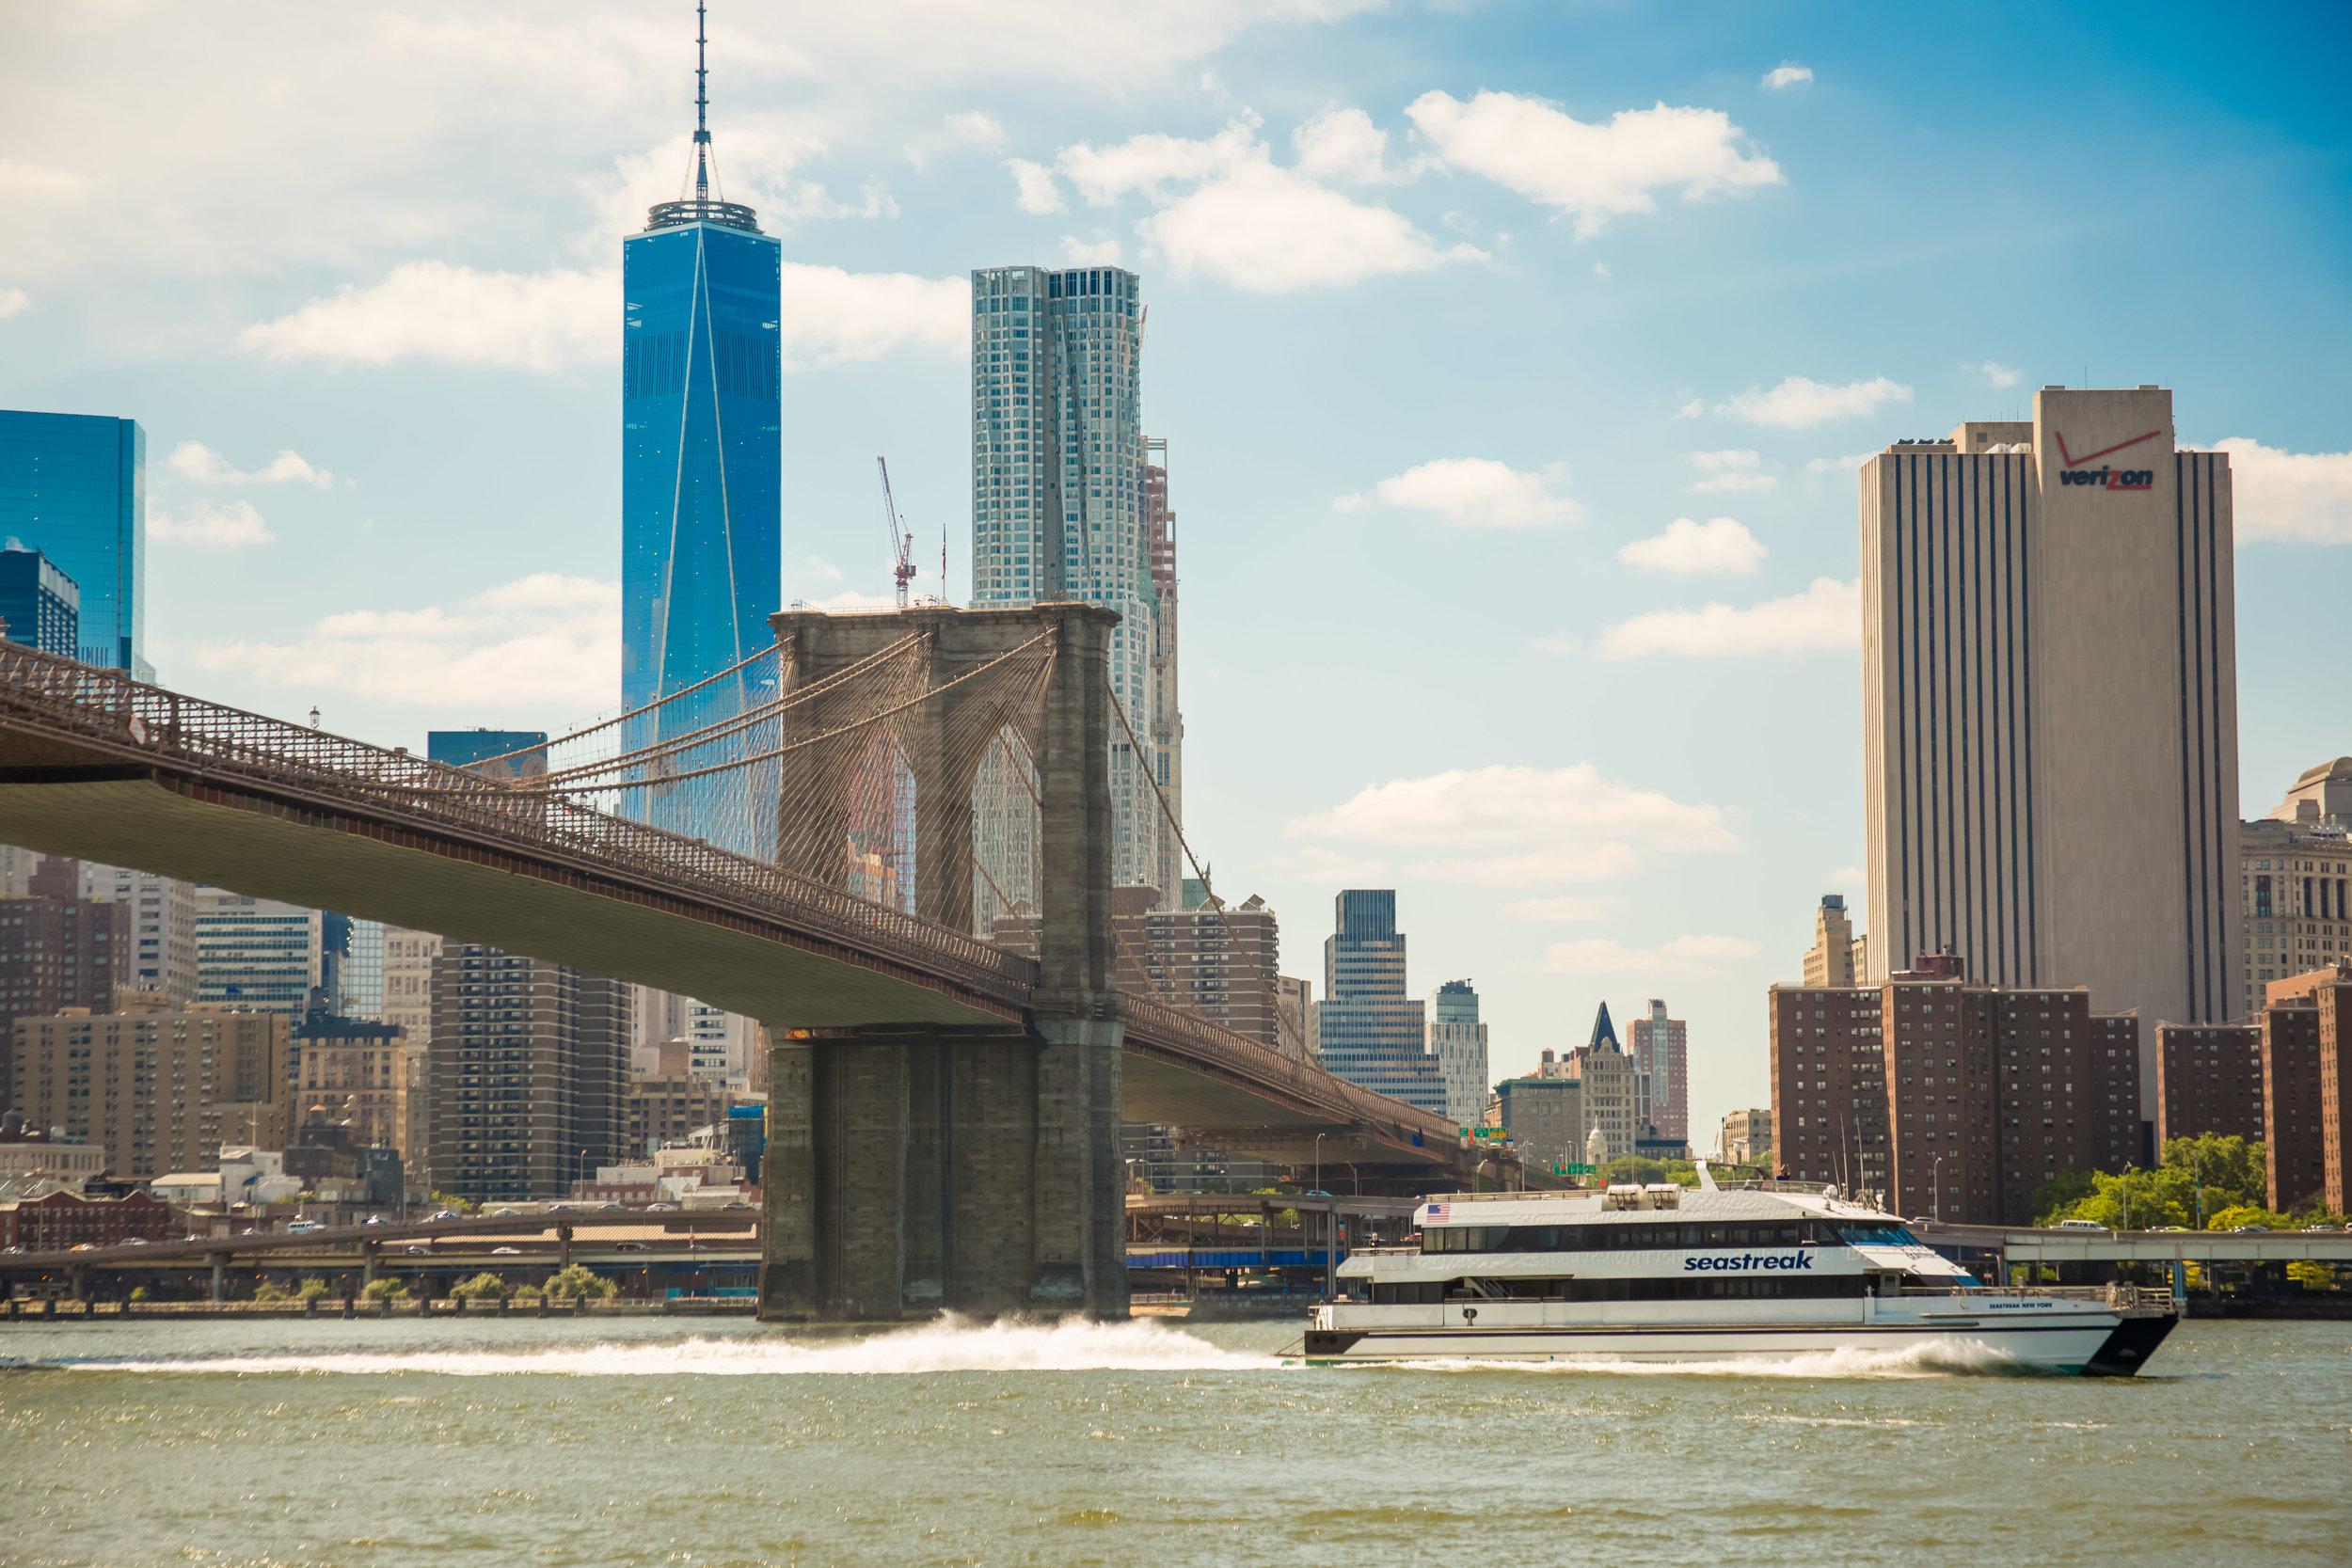 LSNY_Brooklyn_Bridge_Park-40.jpg